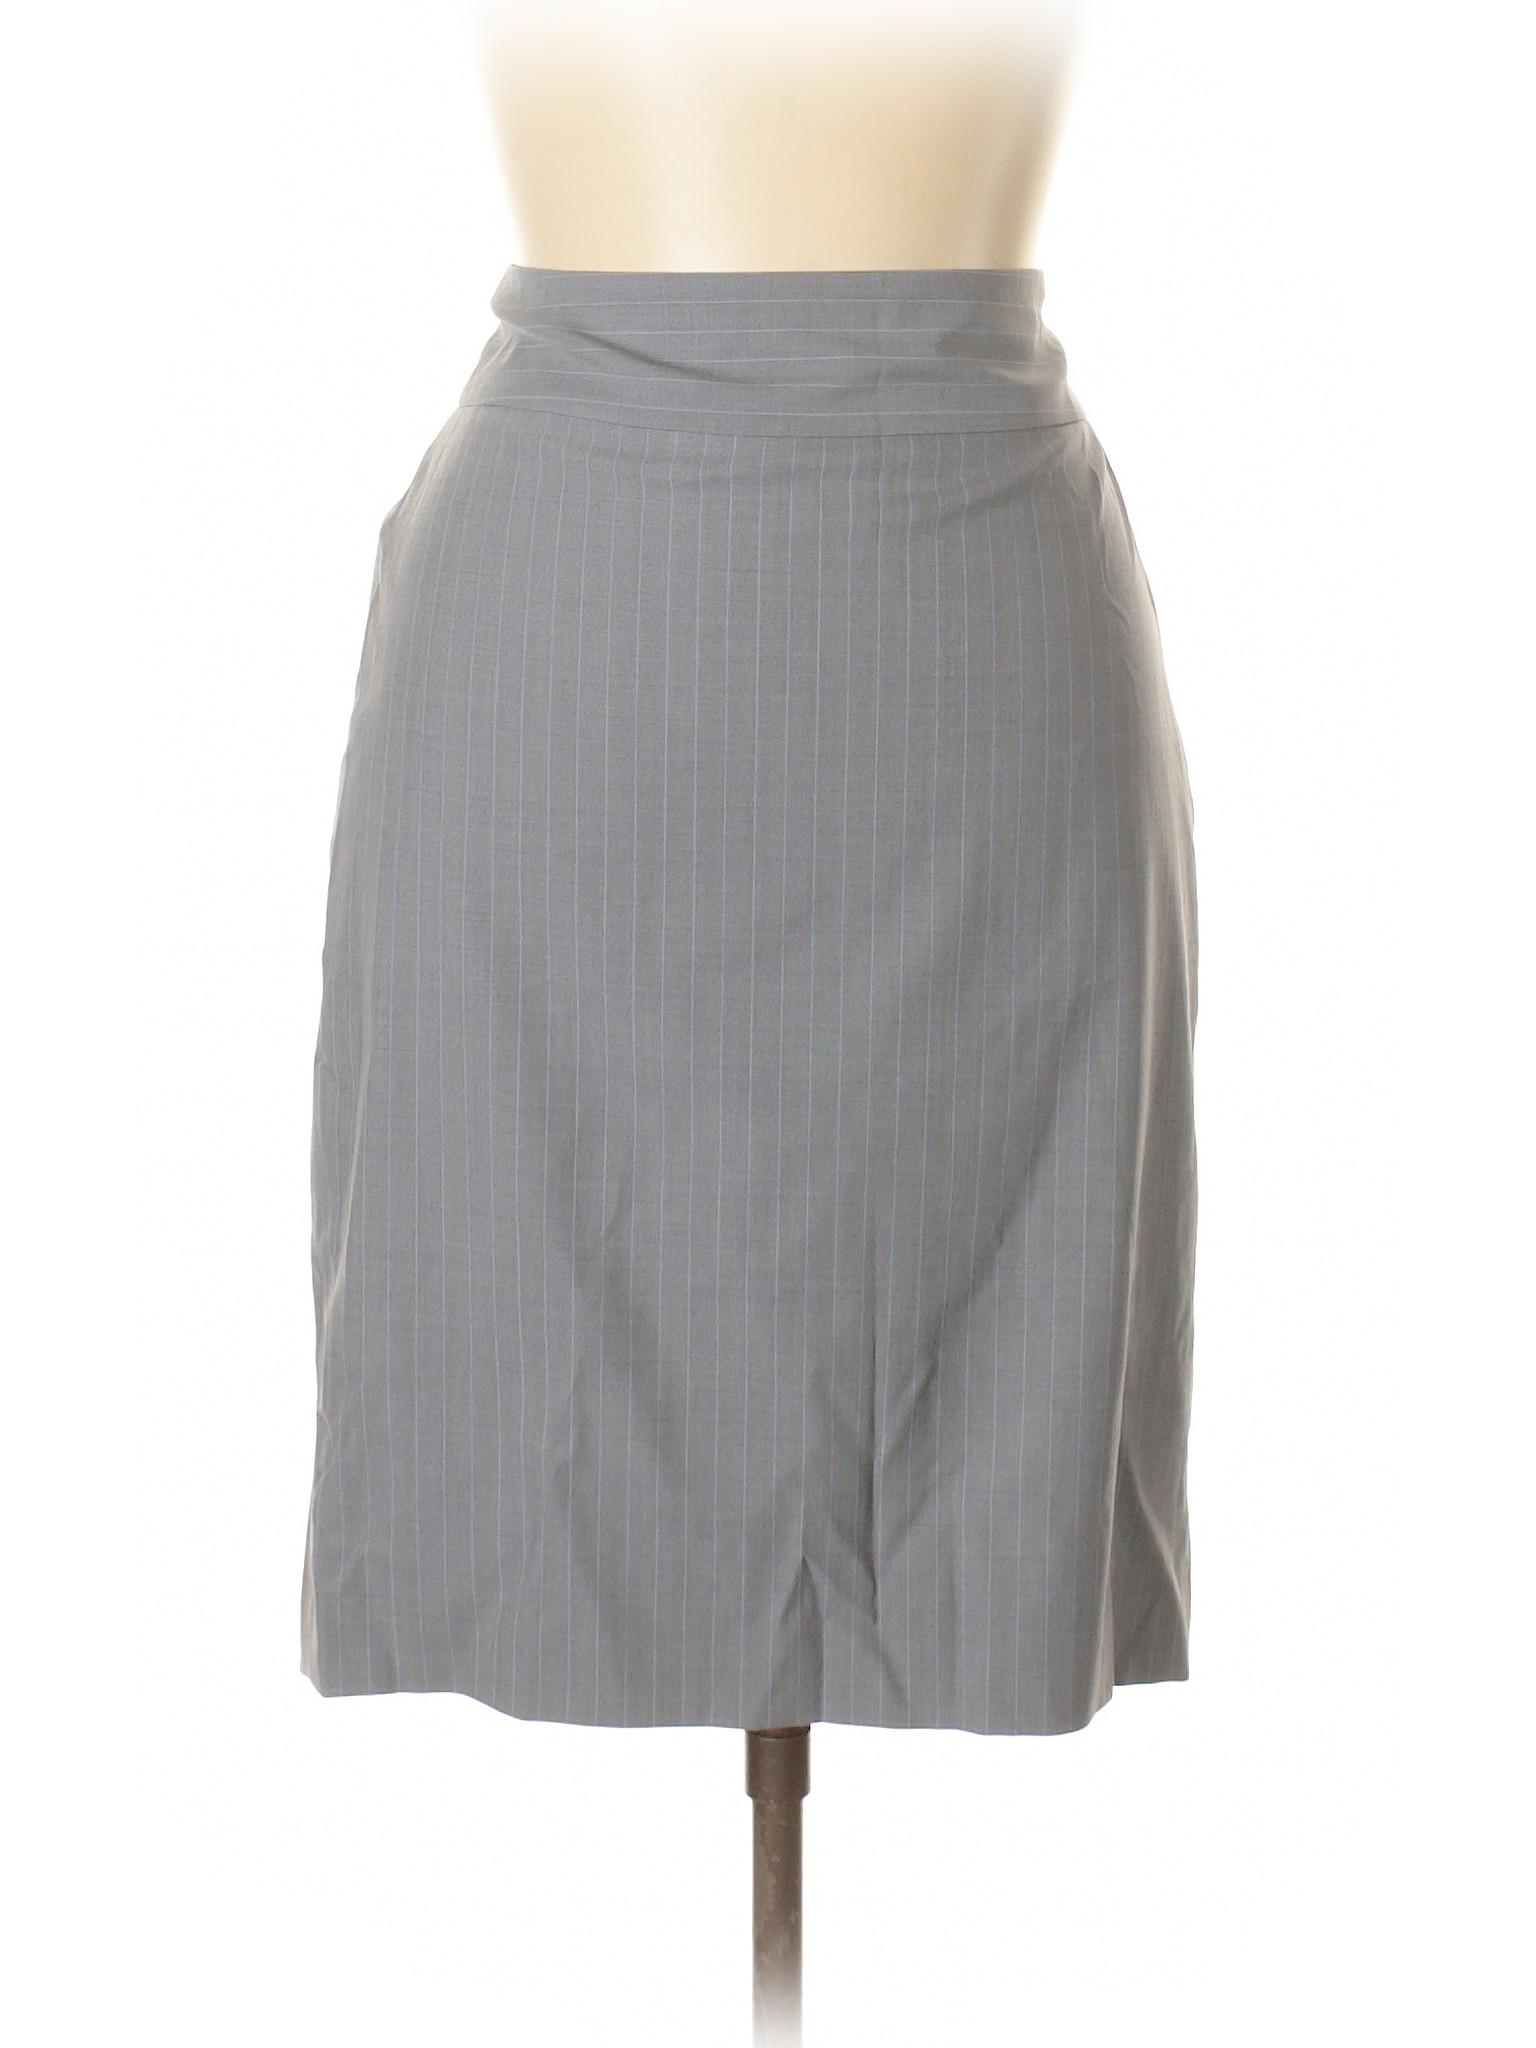 Skirt Wool Boutique Boutique Wool Boutique Skirt Wool Wool Skirt Boutique qdAt6X